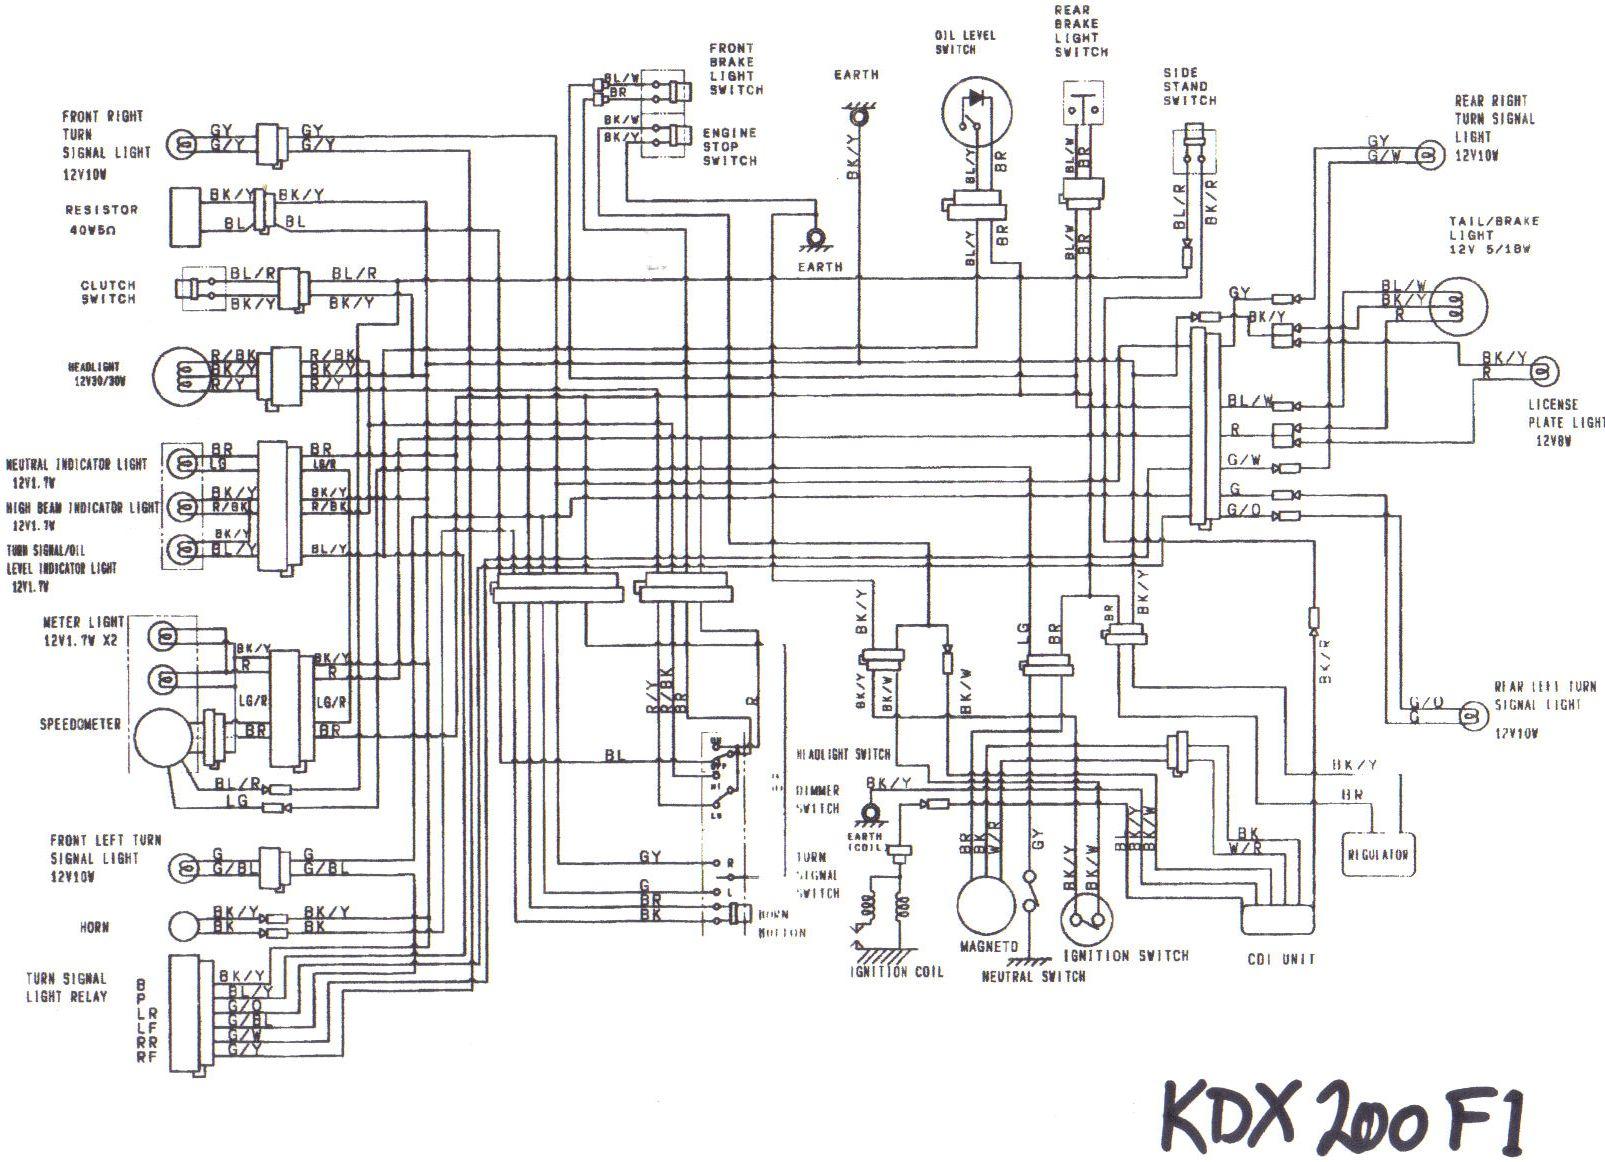 Wiring Diagram Panasonic Cq C7301U The Wiring Diagram – Kawasaki 200 Wiring Diagram